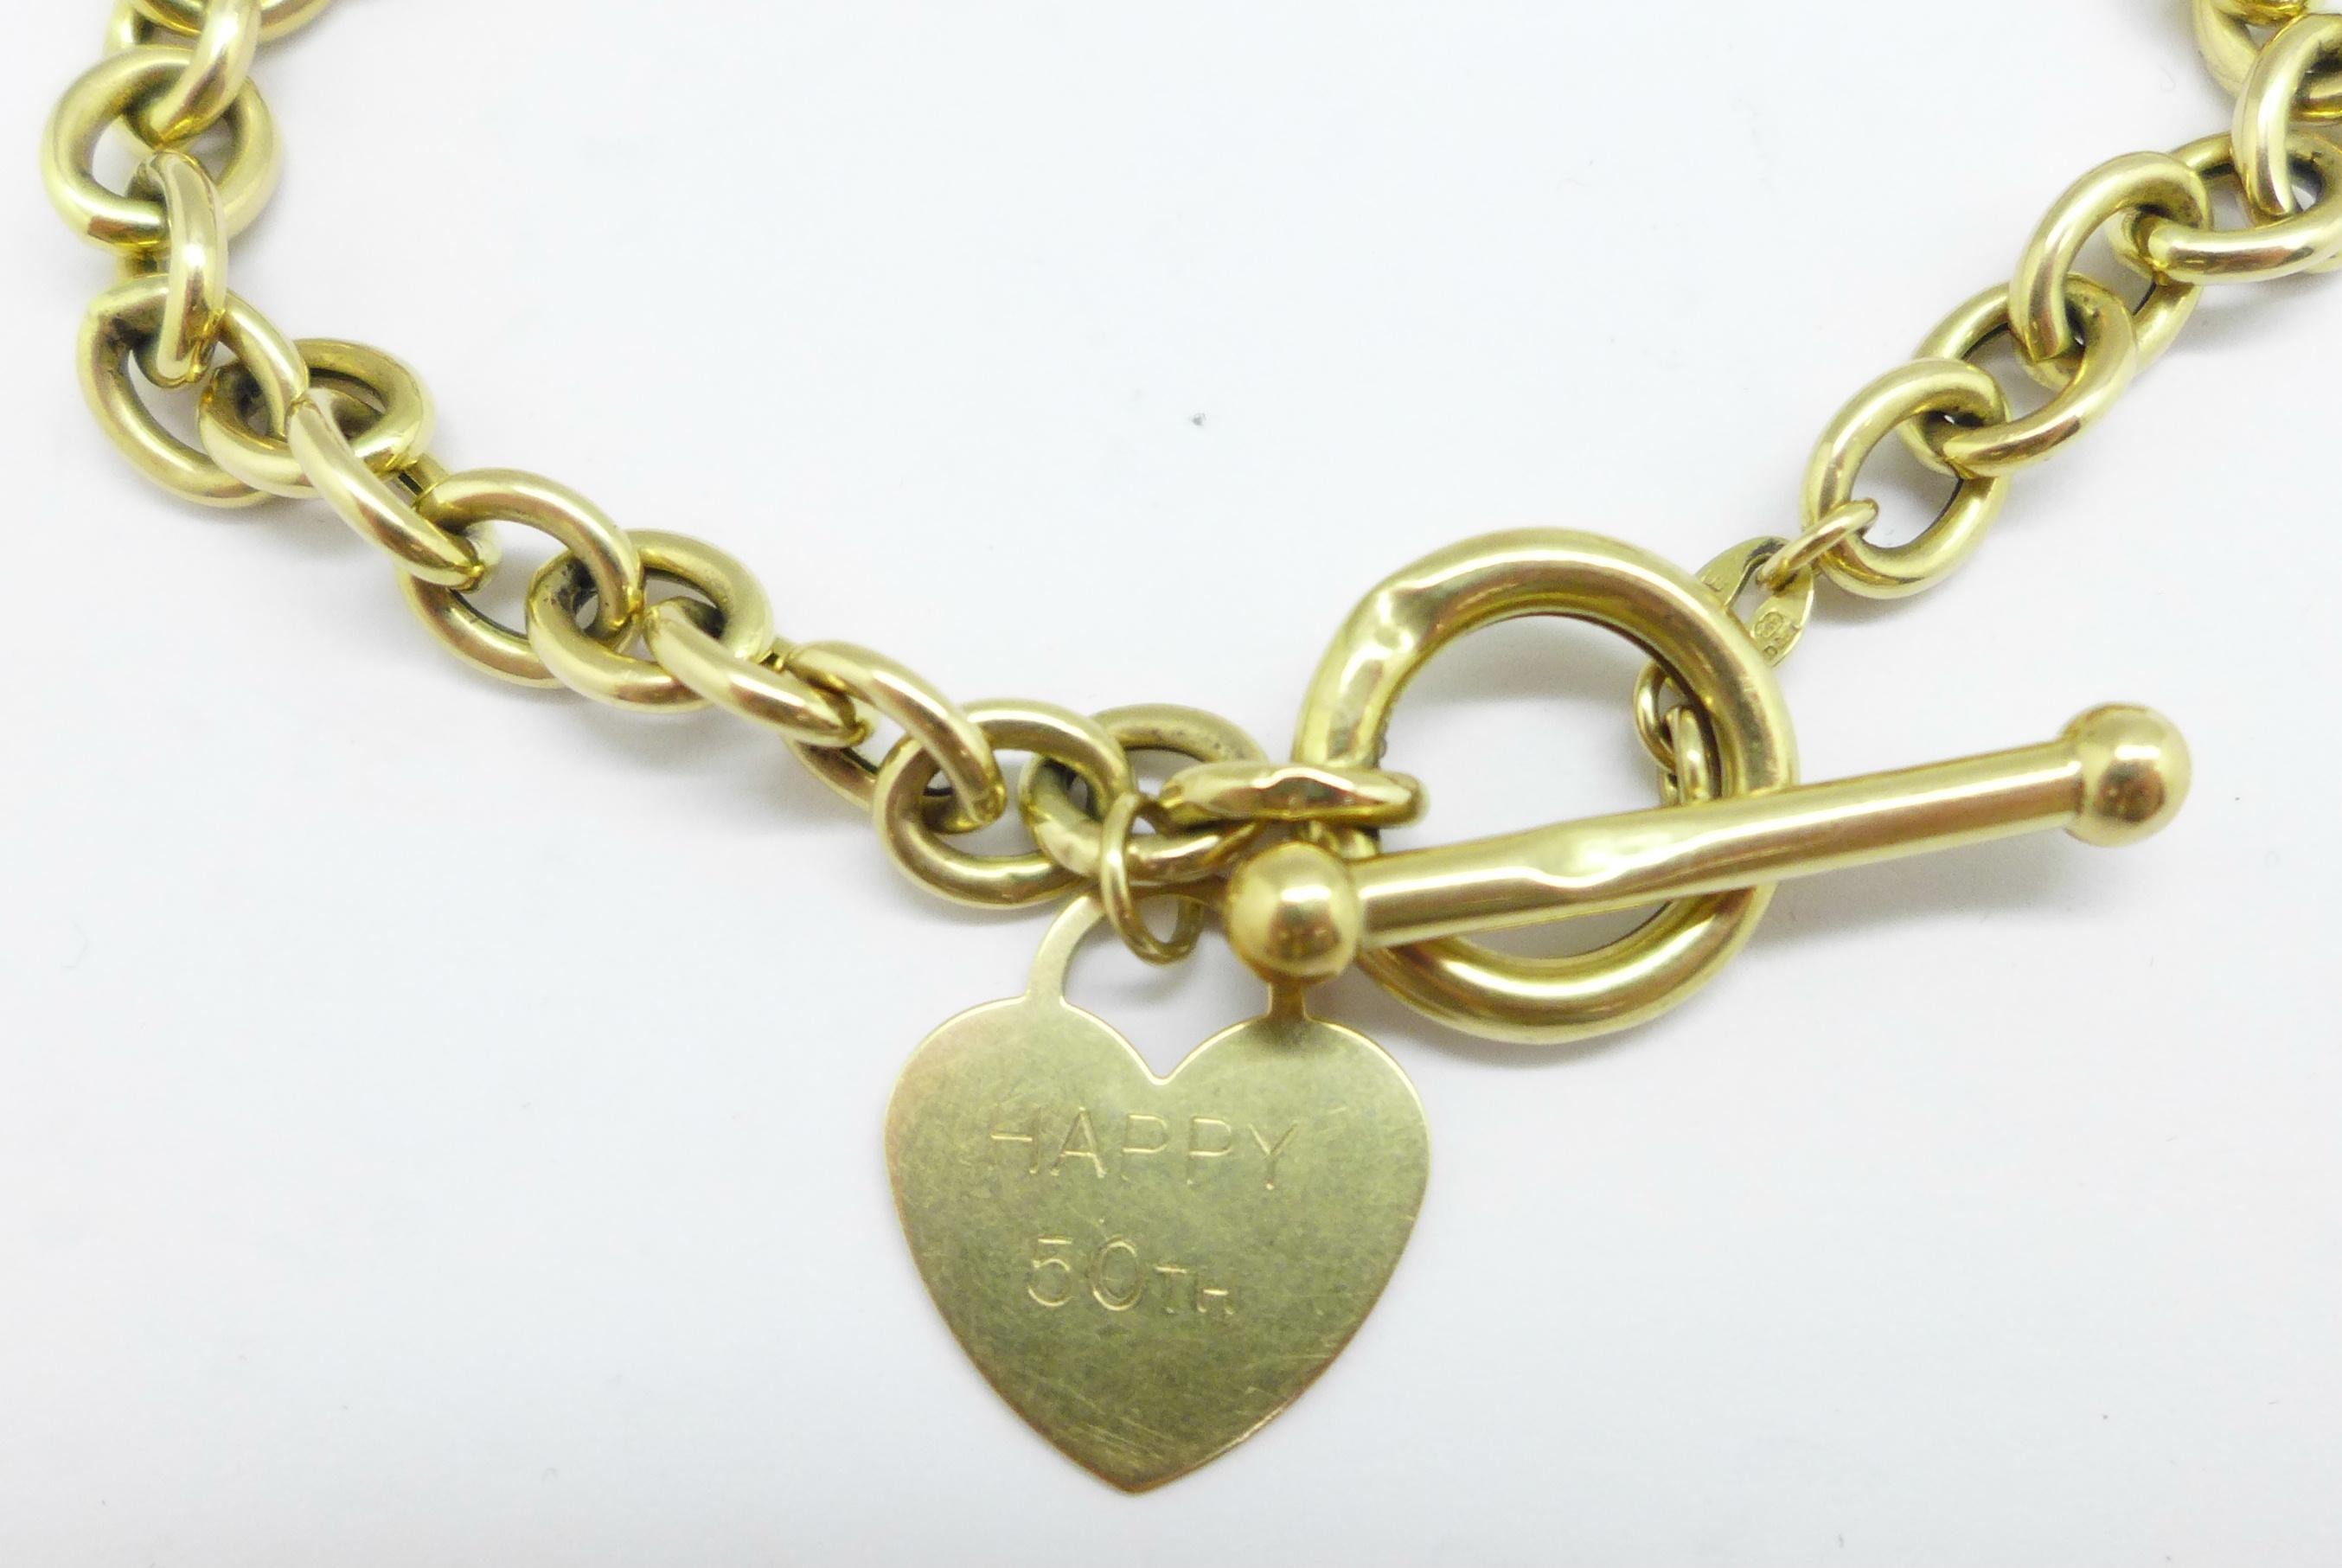 A yellow metal bracelet, 5.5g - Image 2 of 3